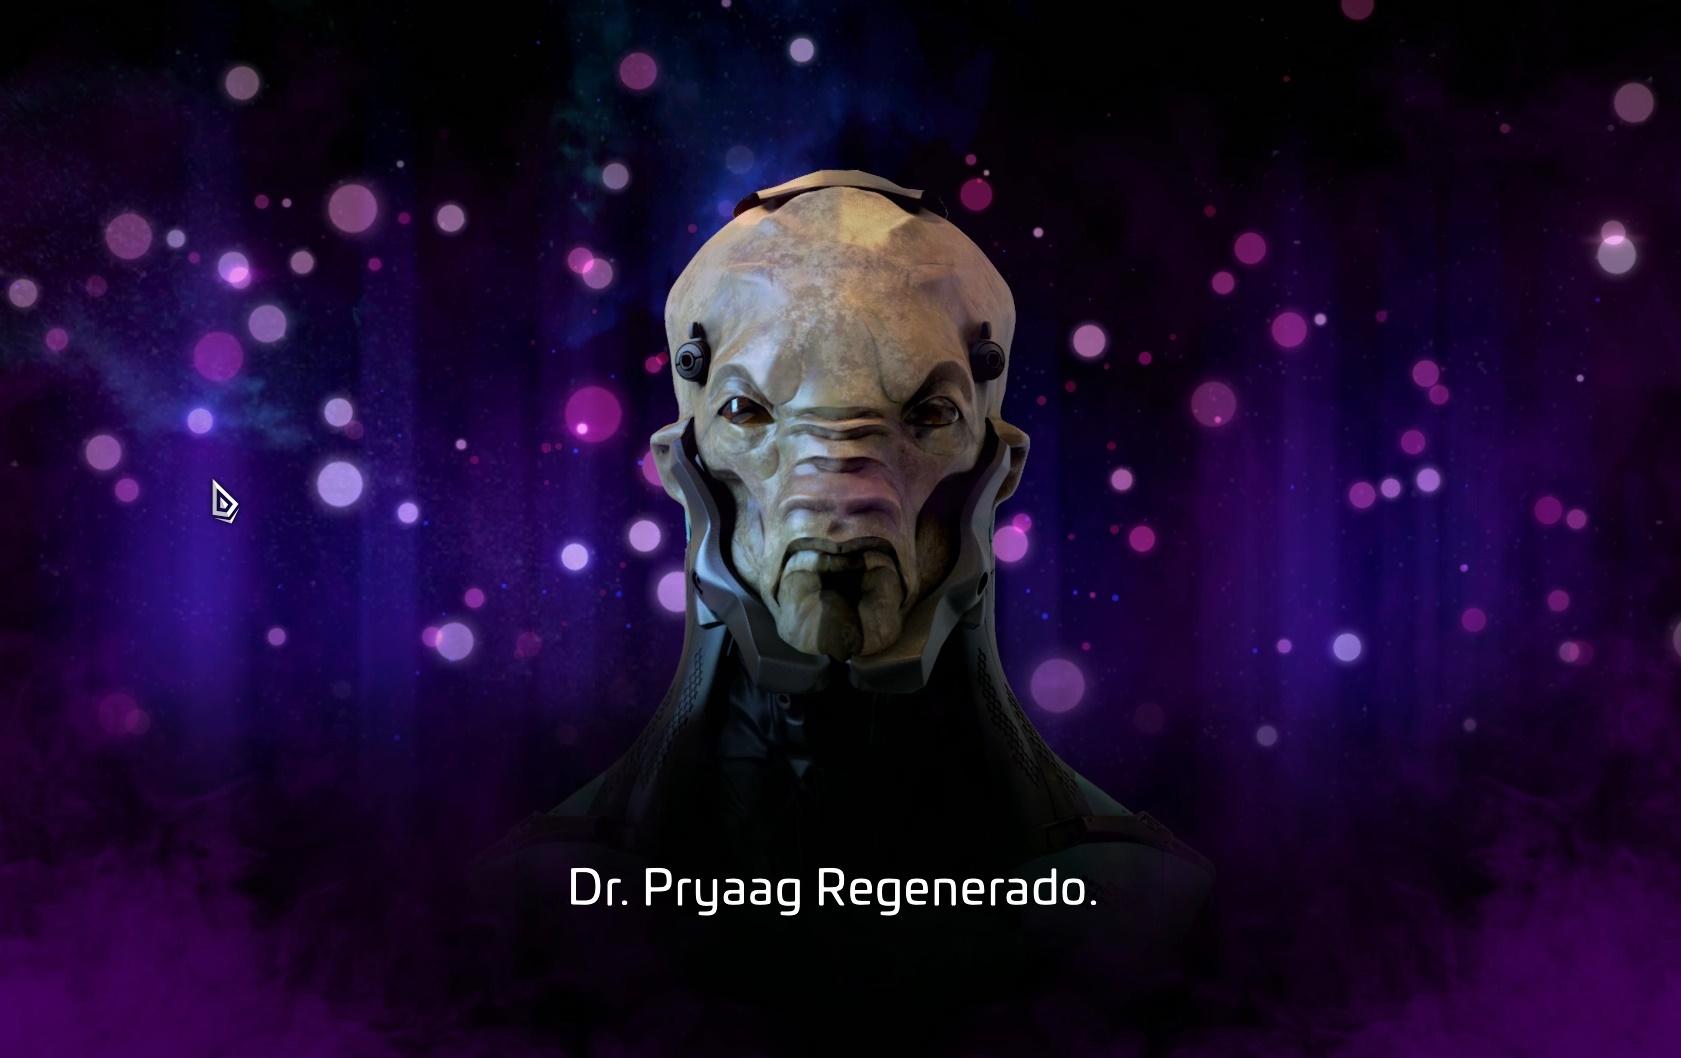 under domain pryaag regenerado